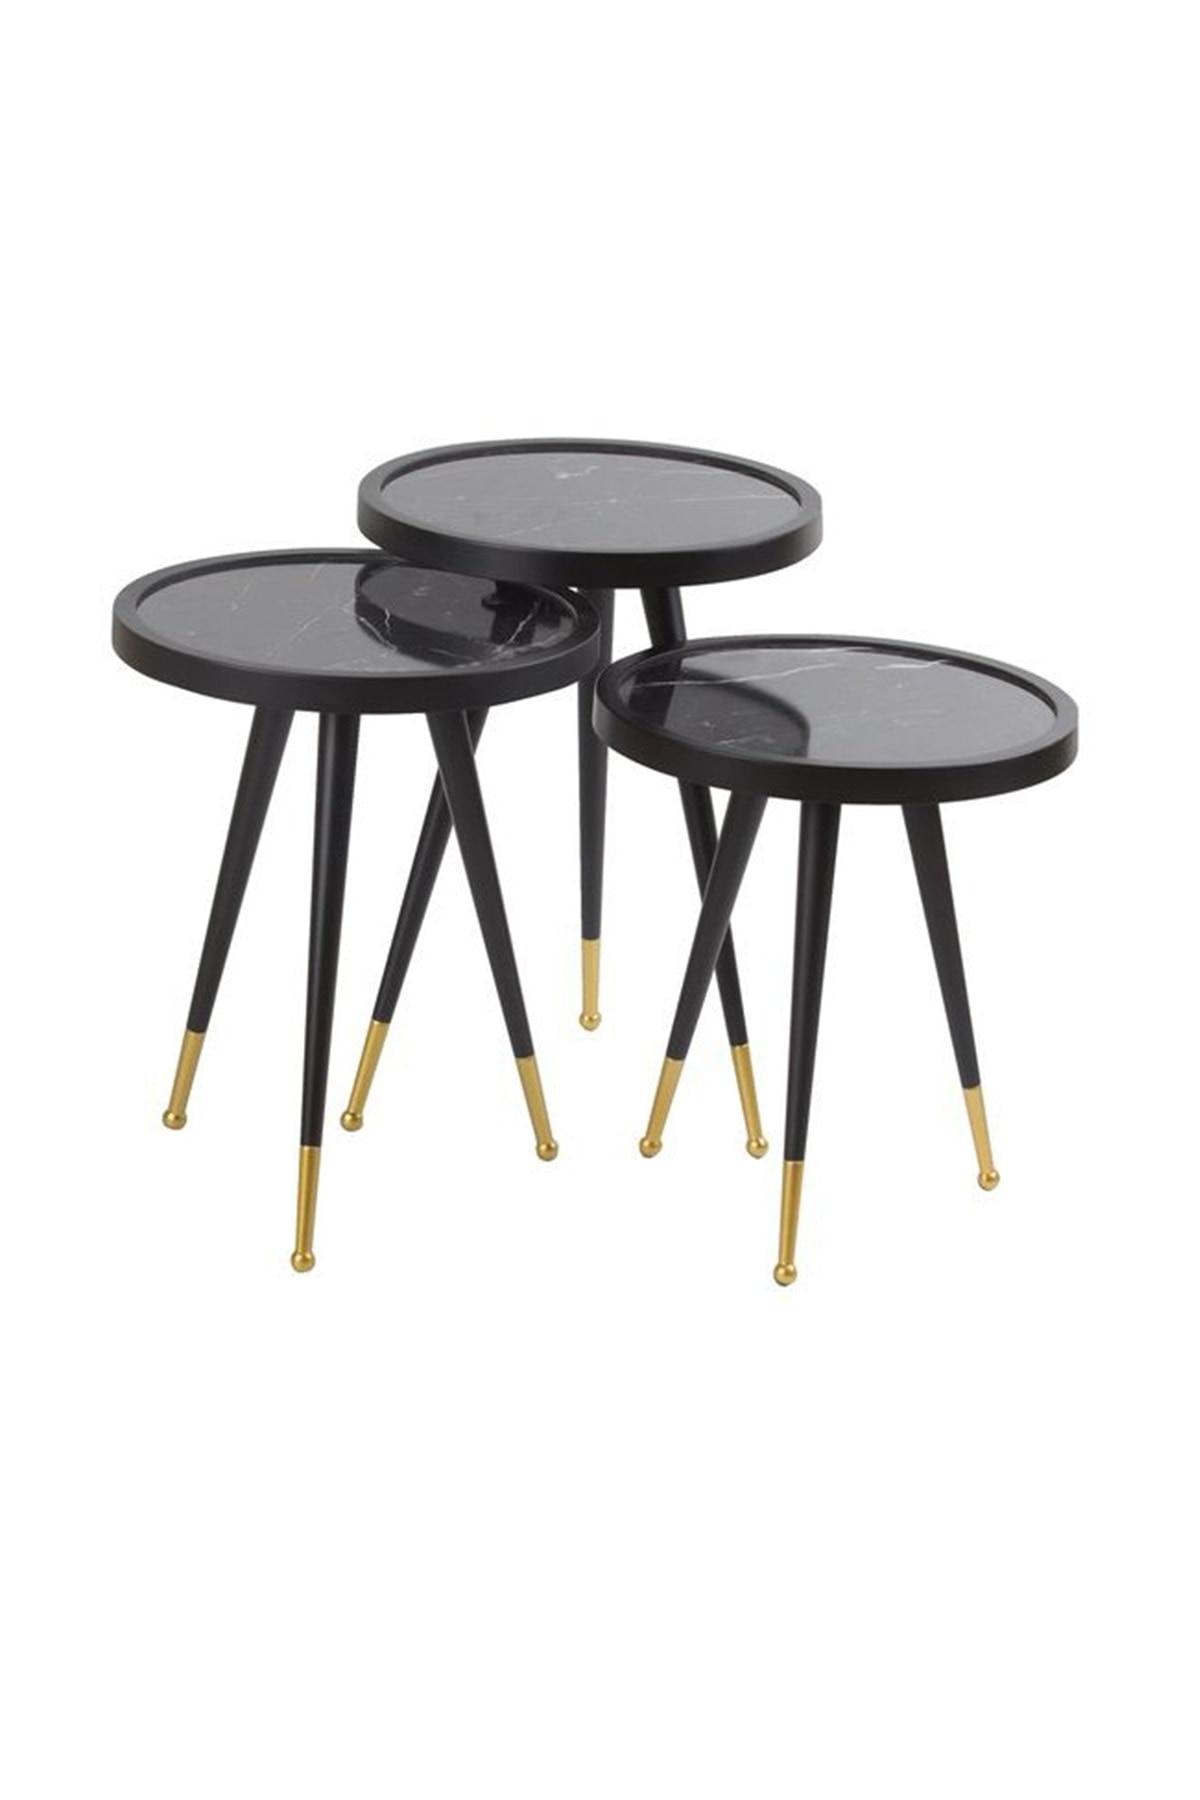 Metal Pedestal 3 Pcs Zigon Coffee Table-Marble Pattern Model Looking Triple Zigon Coffee Table (black And Gold Color)